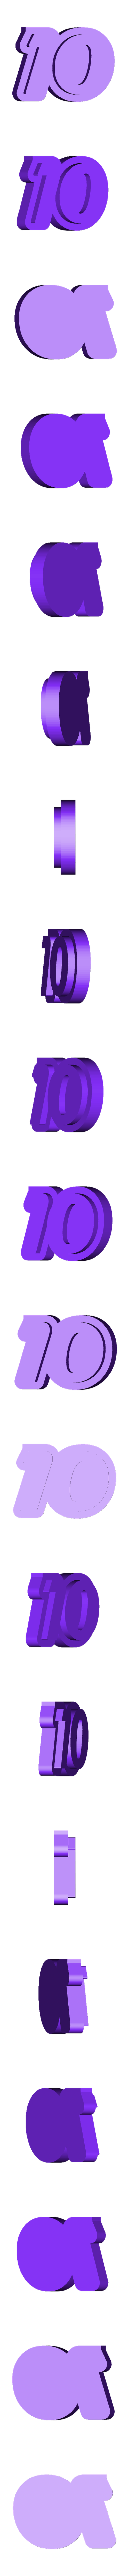 Wall Clock_10.stl Download free STL file Numbers for Bird wall clock • 3D printable design, MAyobe